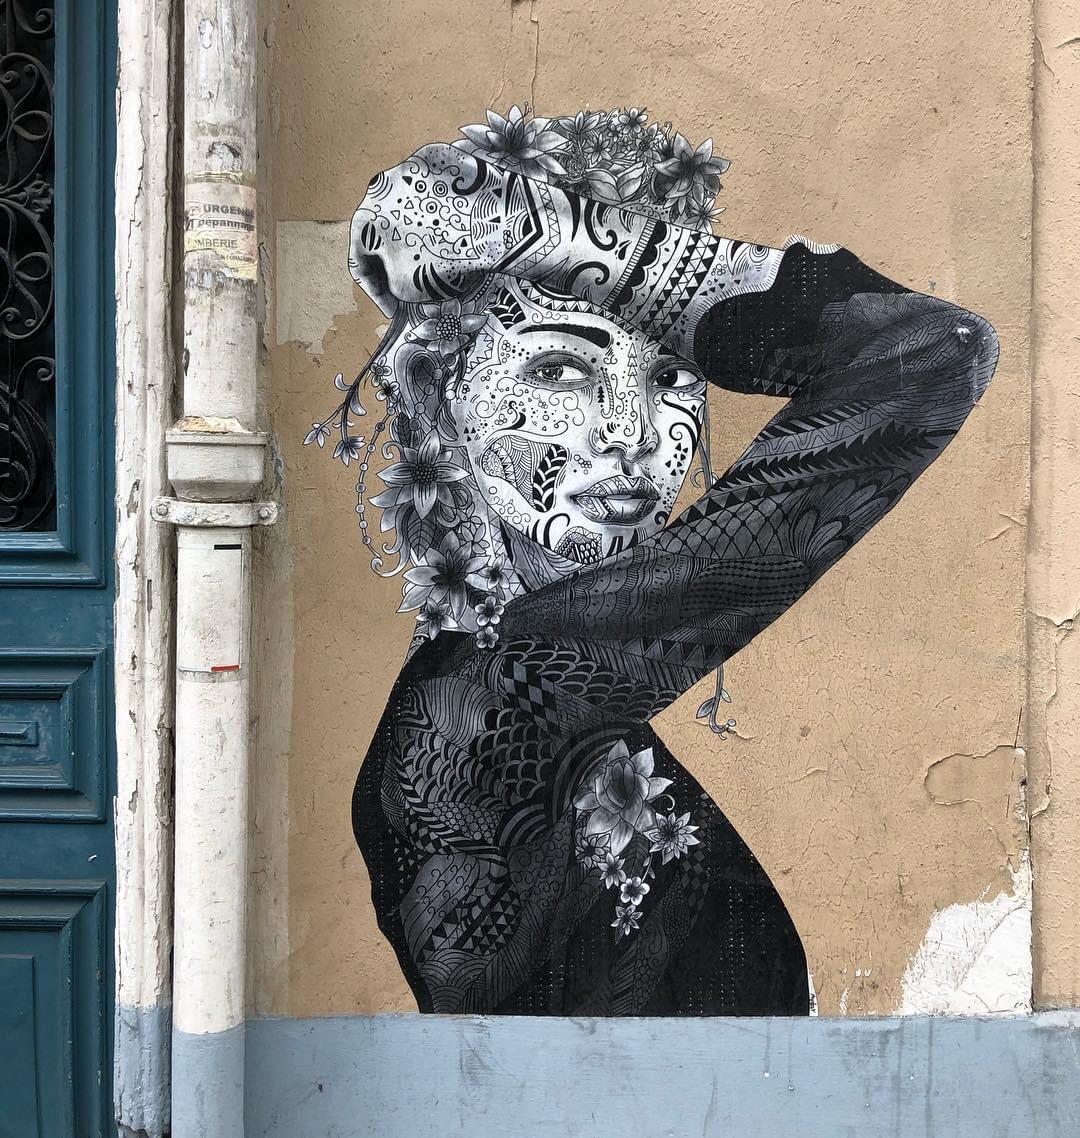 Another by Aydar in Paris (Photo by Artist) #StreetArt #Aydar #Paris pic.twitter.com/FNl0kjKkSq